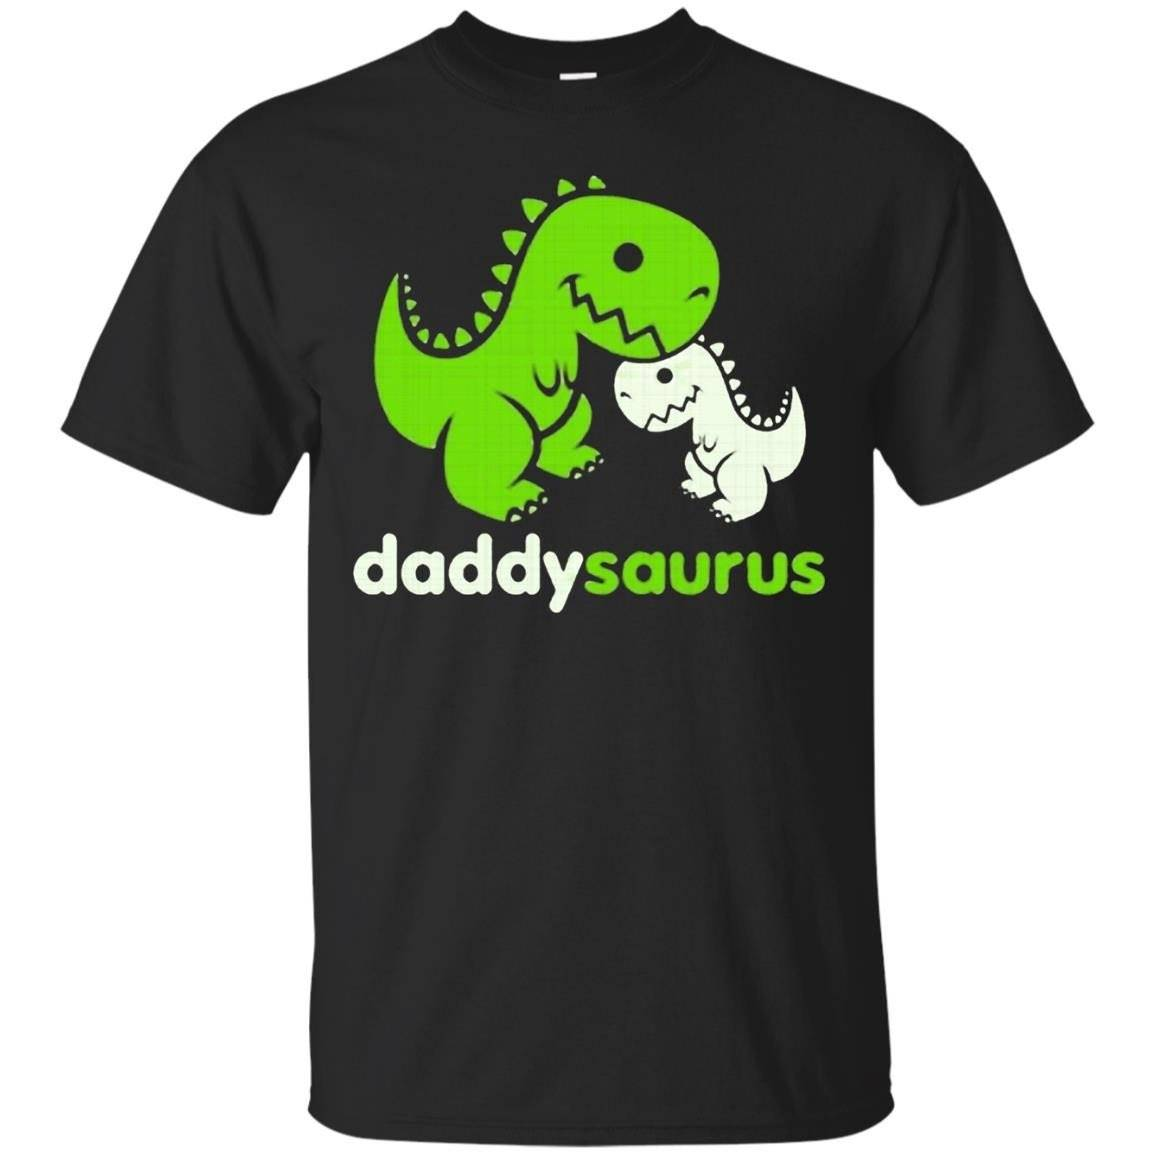 Daddy Saurus Funny Shirt – T-Shirt